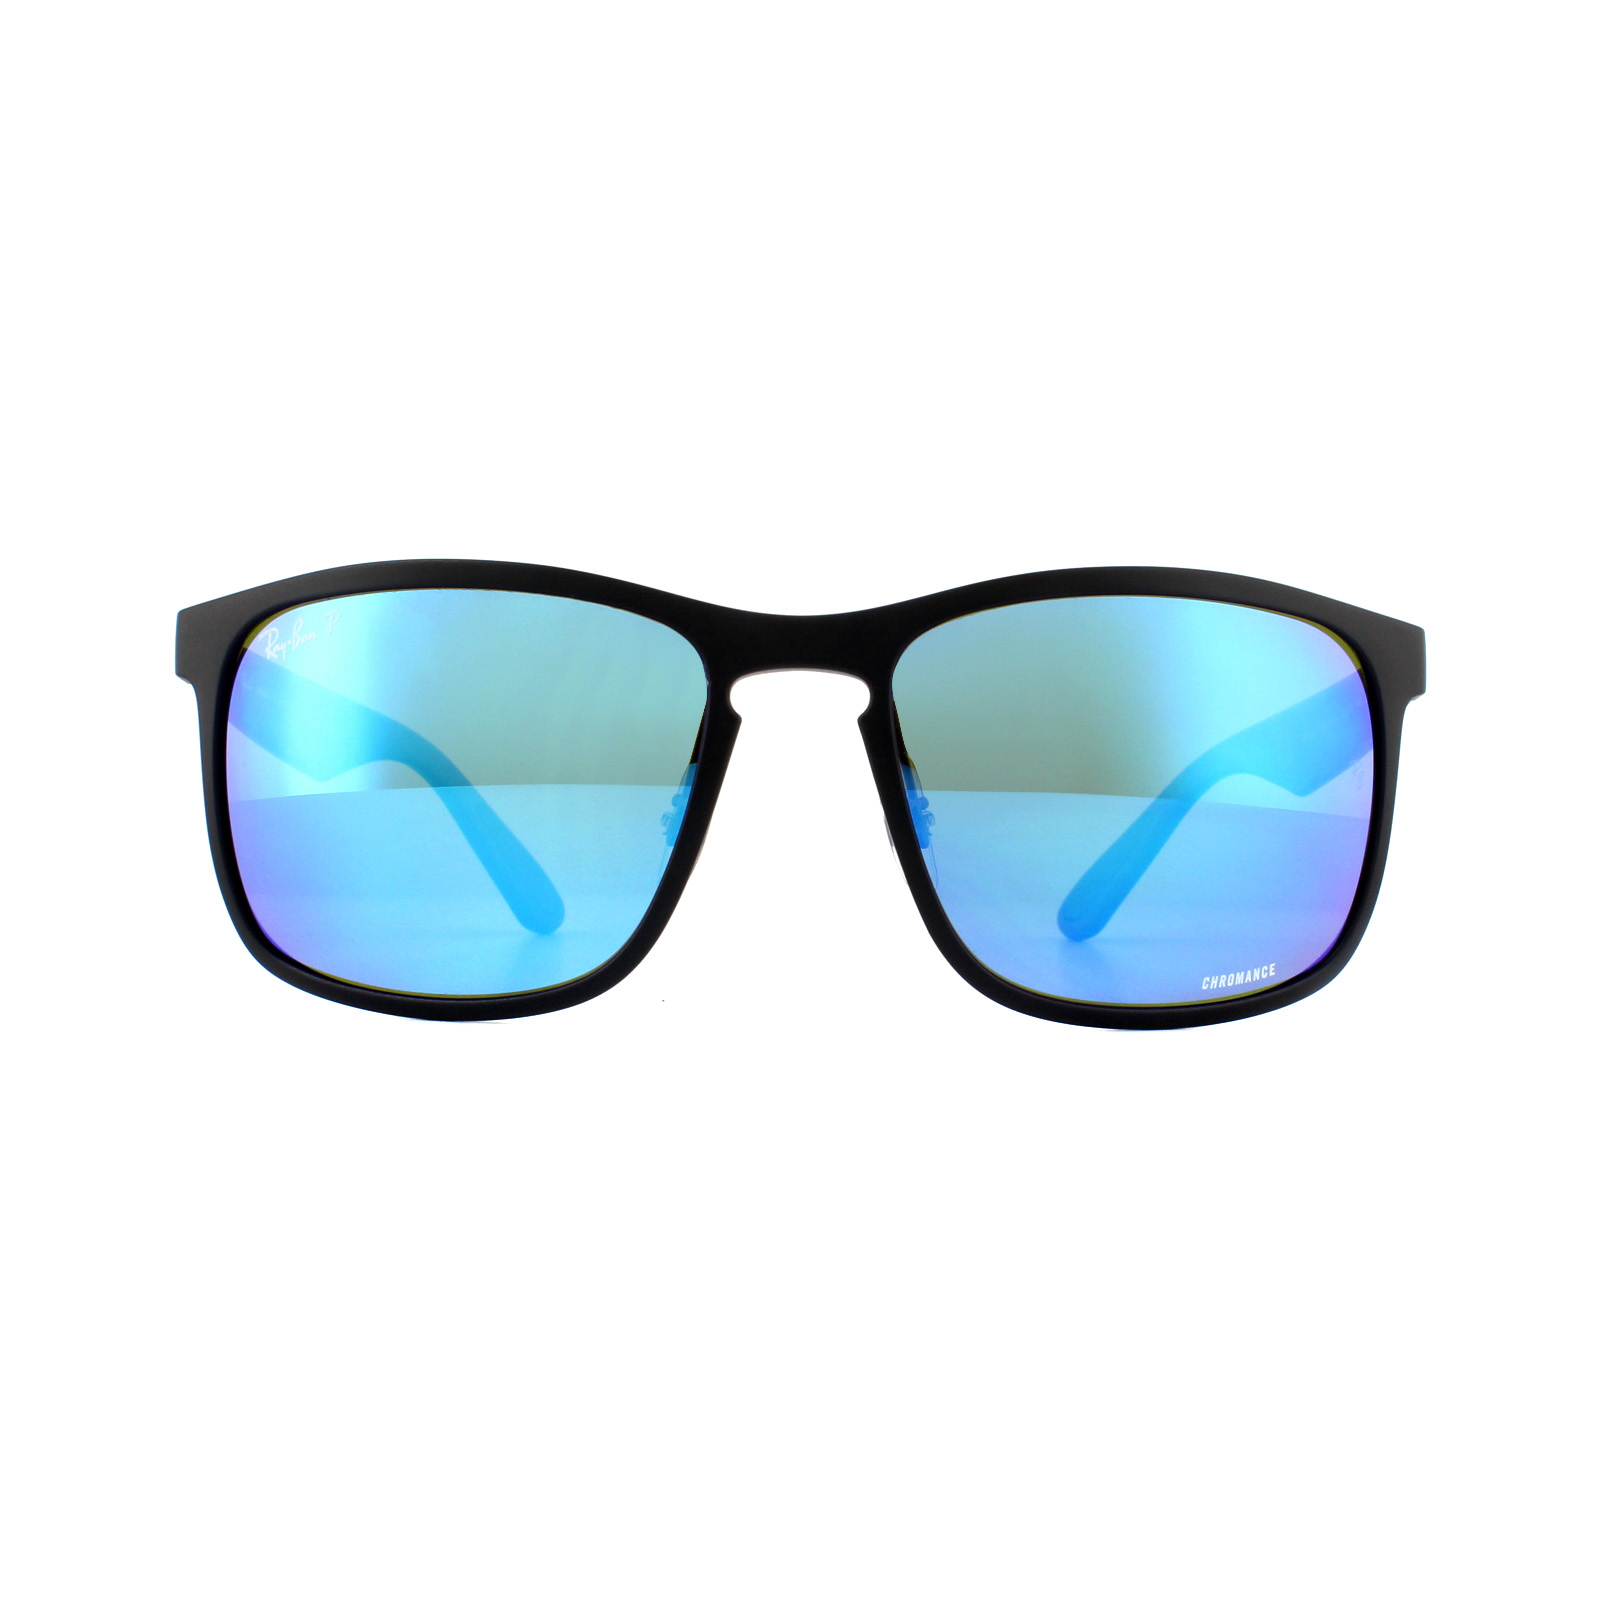 bede7cc2b8 Sentinel Ray-Ban Sunglasses RB4264 601SA1 Matte Black Blue Flash Polarized  Chromance